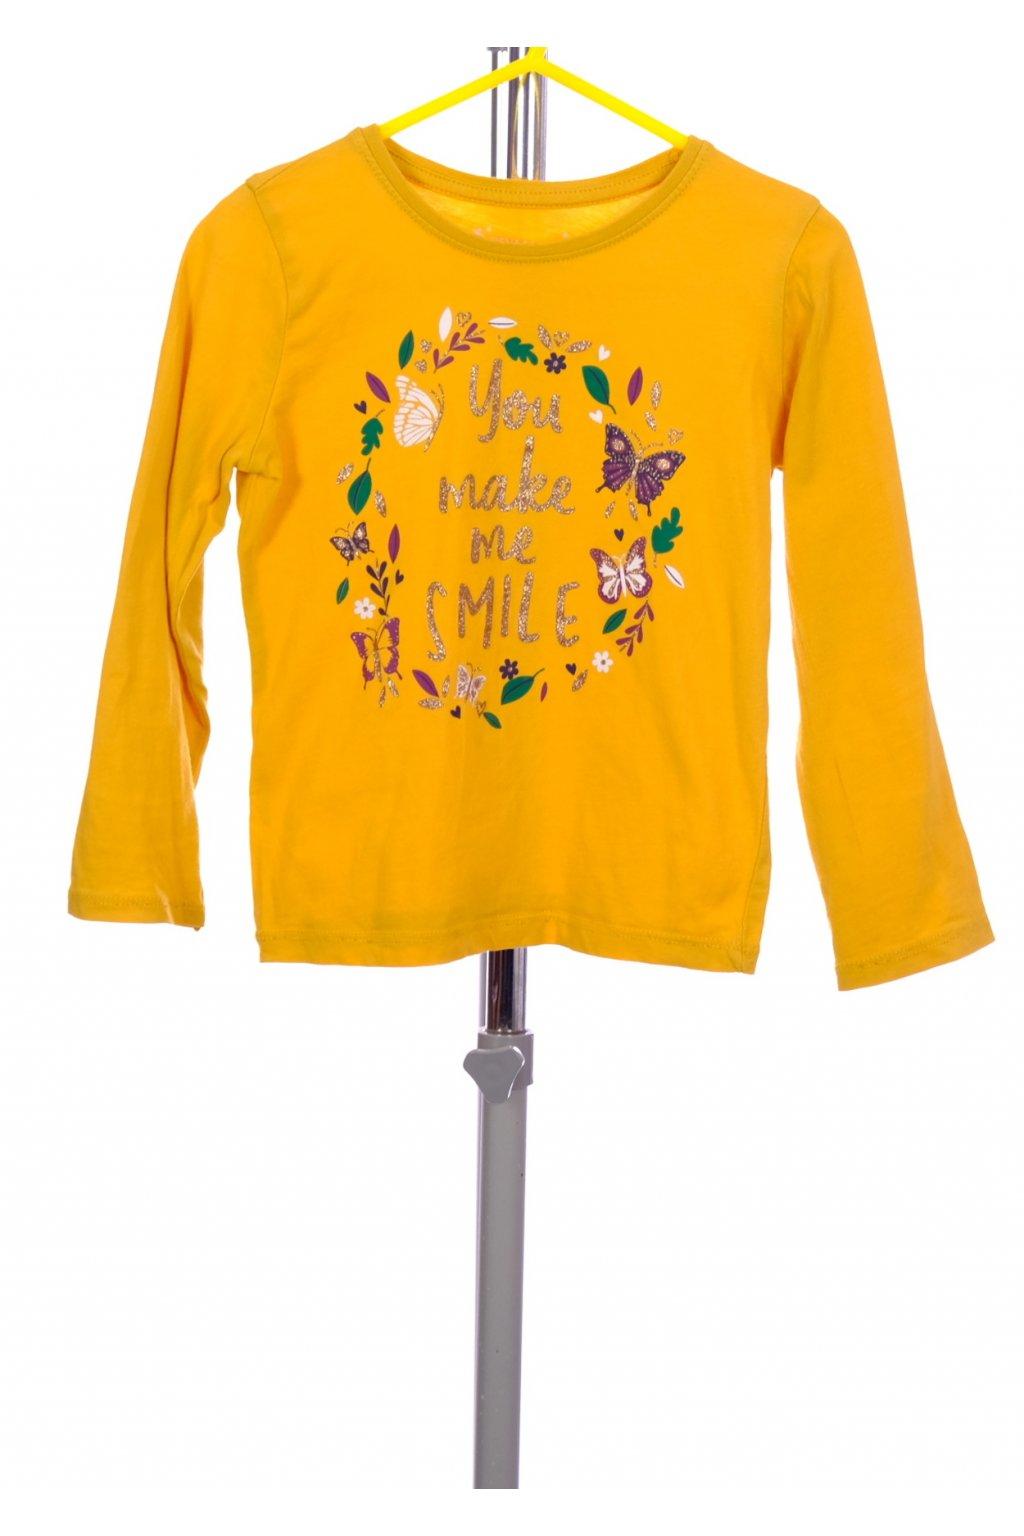 Tričko Primark žluté s obrázkem vel. 104 / 3 - 4 roky